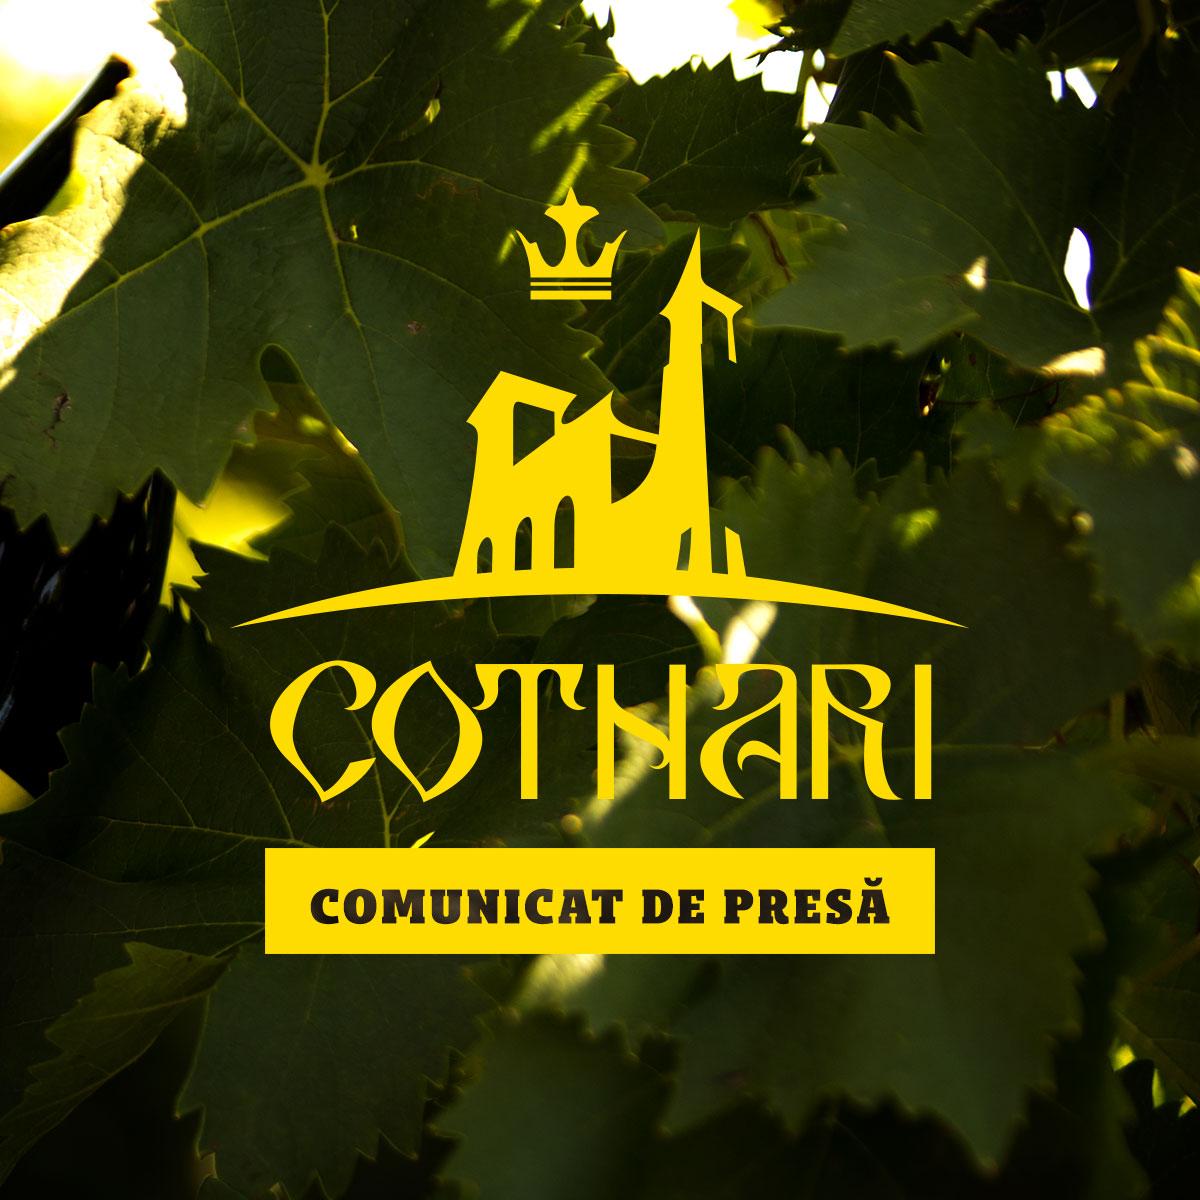 https://www.cotnari.ro/continut/uploads/2017/08/comunicat15.jpg